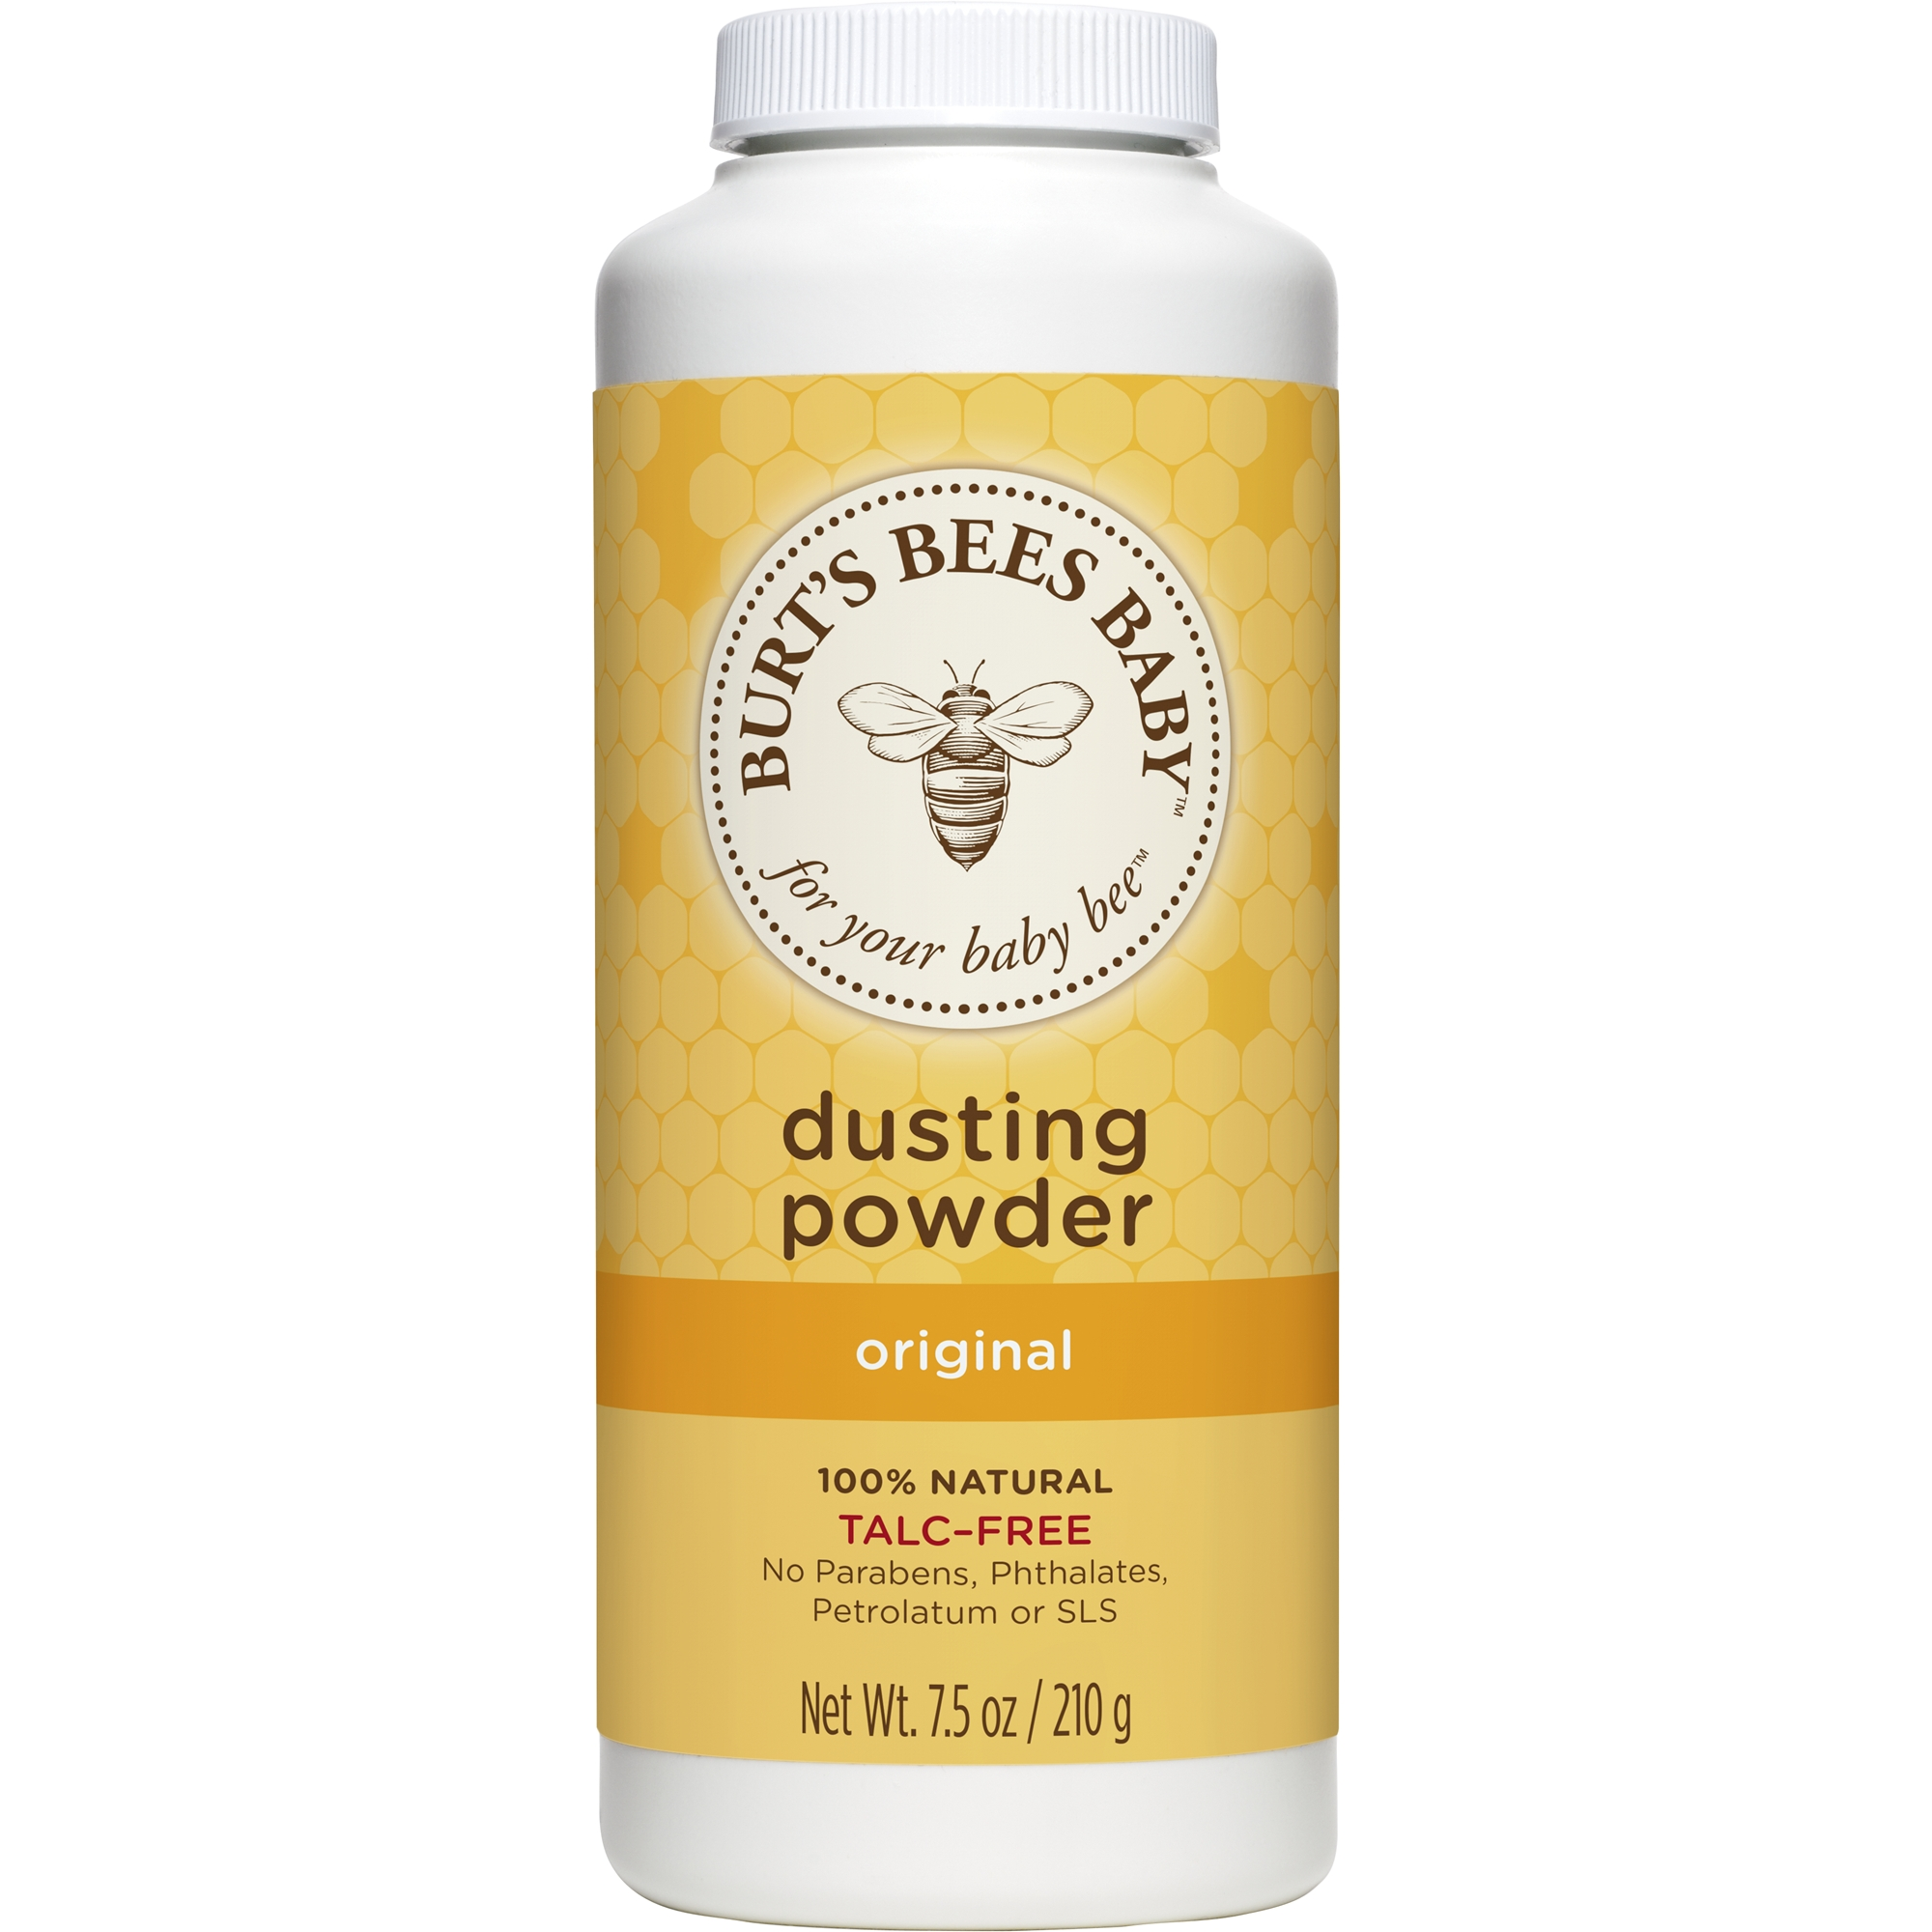 Burt's Bees Baby 100% Natural Dusting Powder, Talc-Free Baby Powder - 7.5 oz Bottle